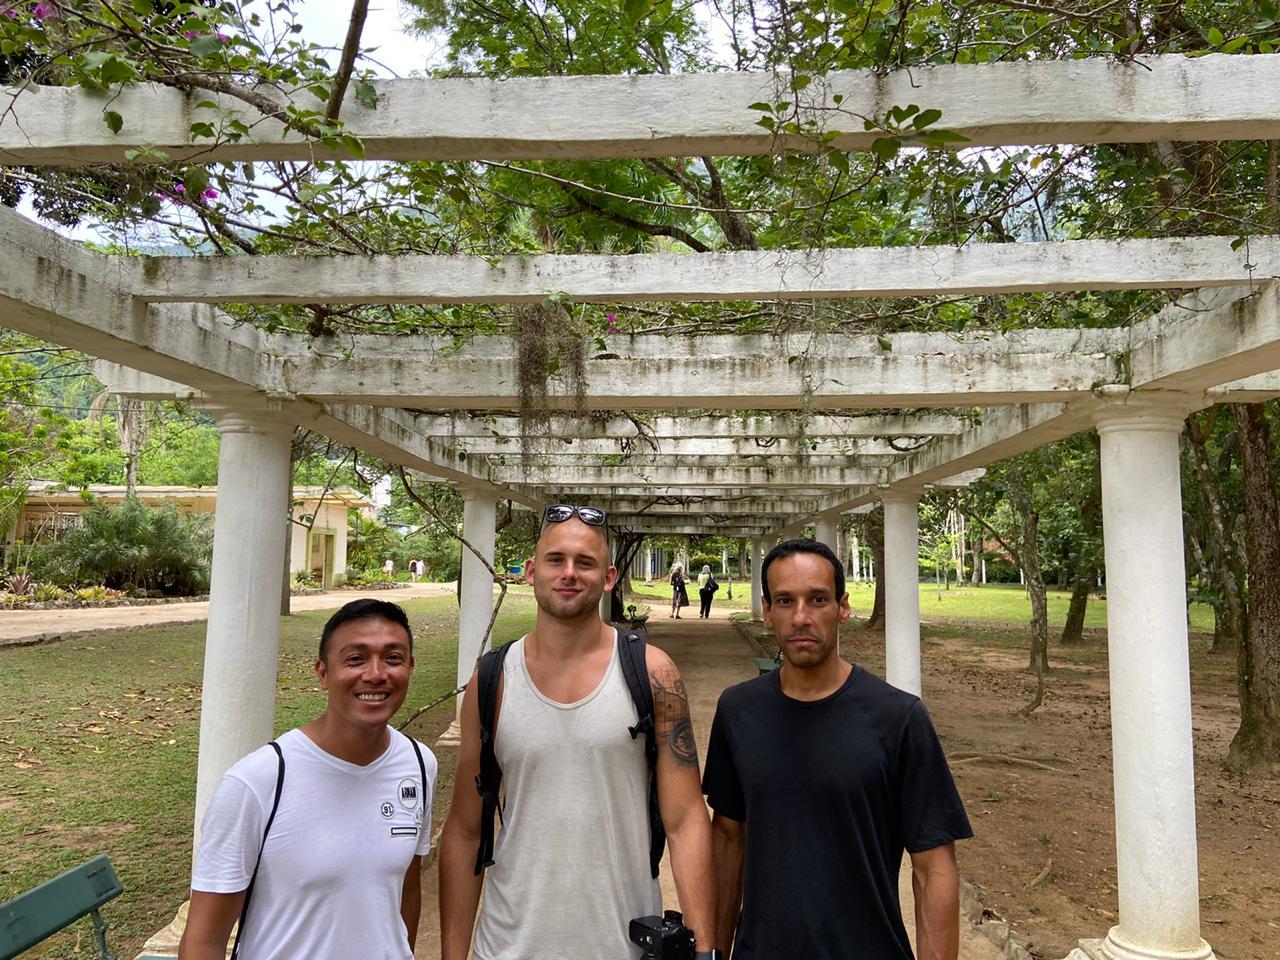 Students strolling through the Botanical Garden